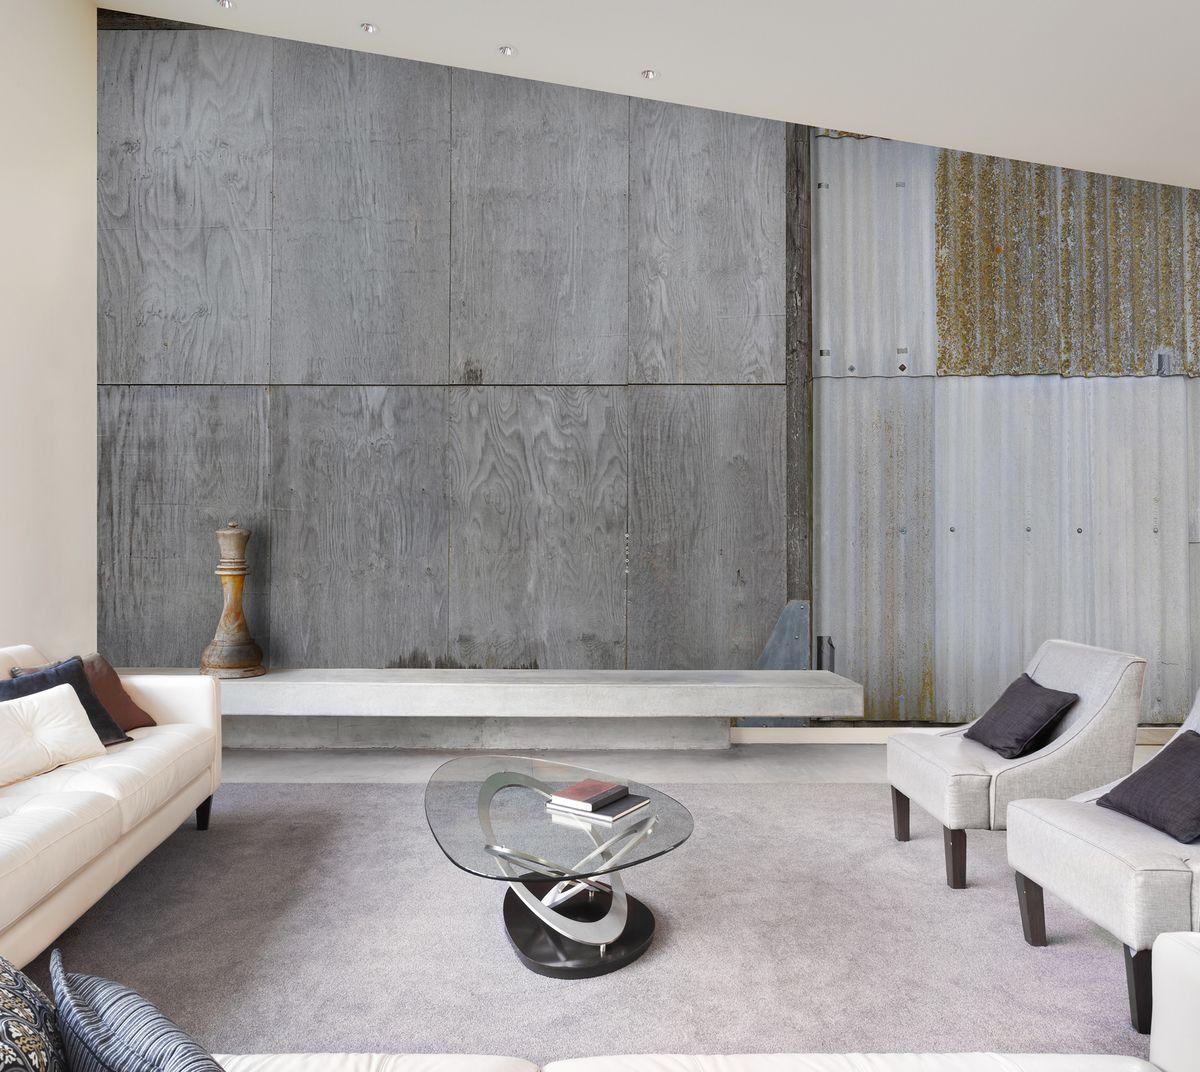 belles mati res incr ation rev tement mural et papier. Black Bedroom Furniture Sets. Home Design Ideas